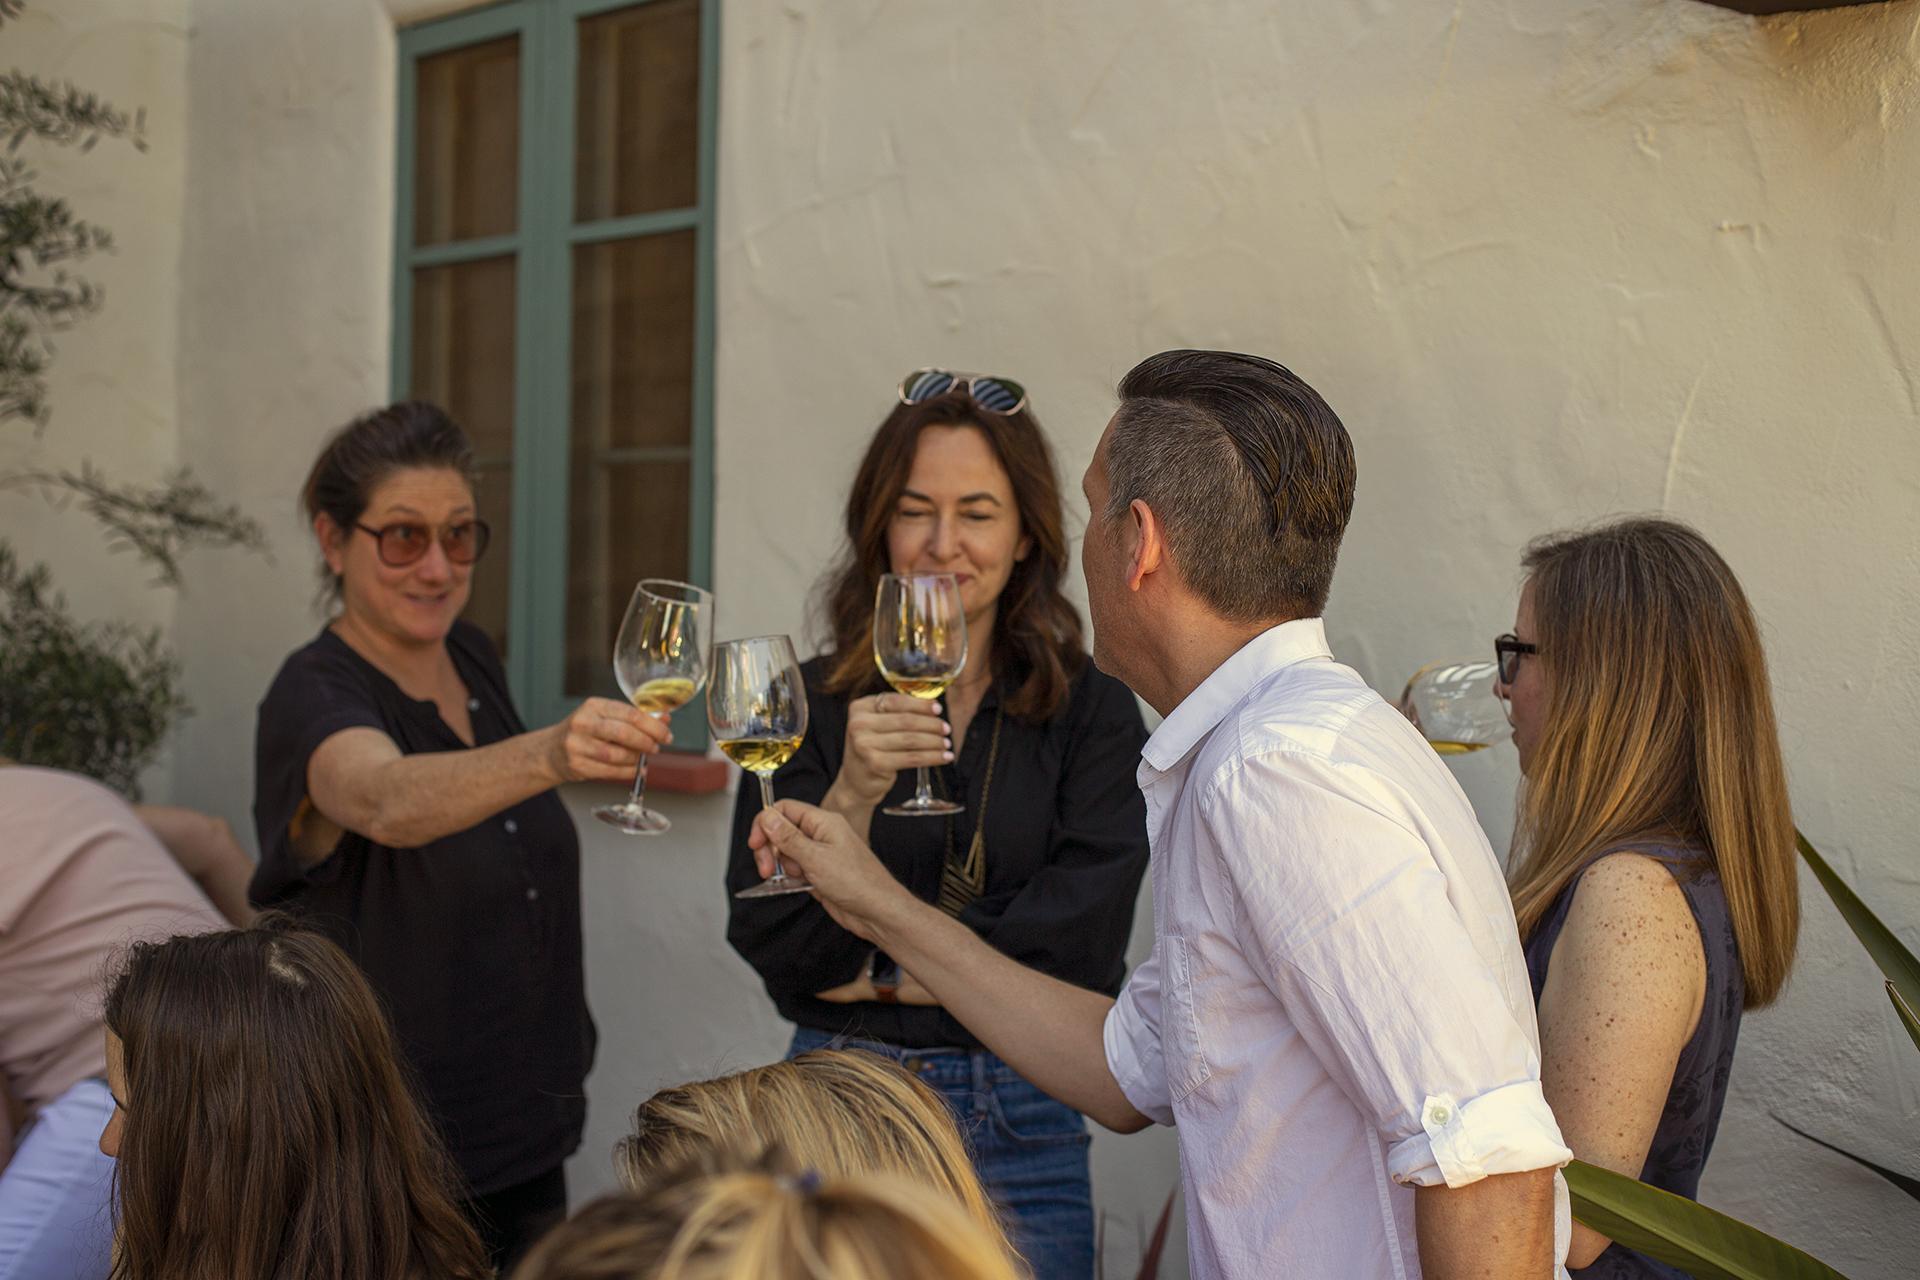 Vino Italiano: Naturally - We gathered at a beautiful Spanish Colonial Revival house in the San Rafael neighborhood of Pasadena, and tasted natural Italian wines.